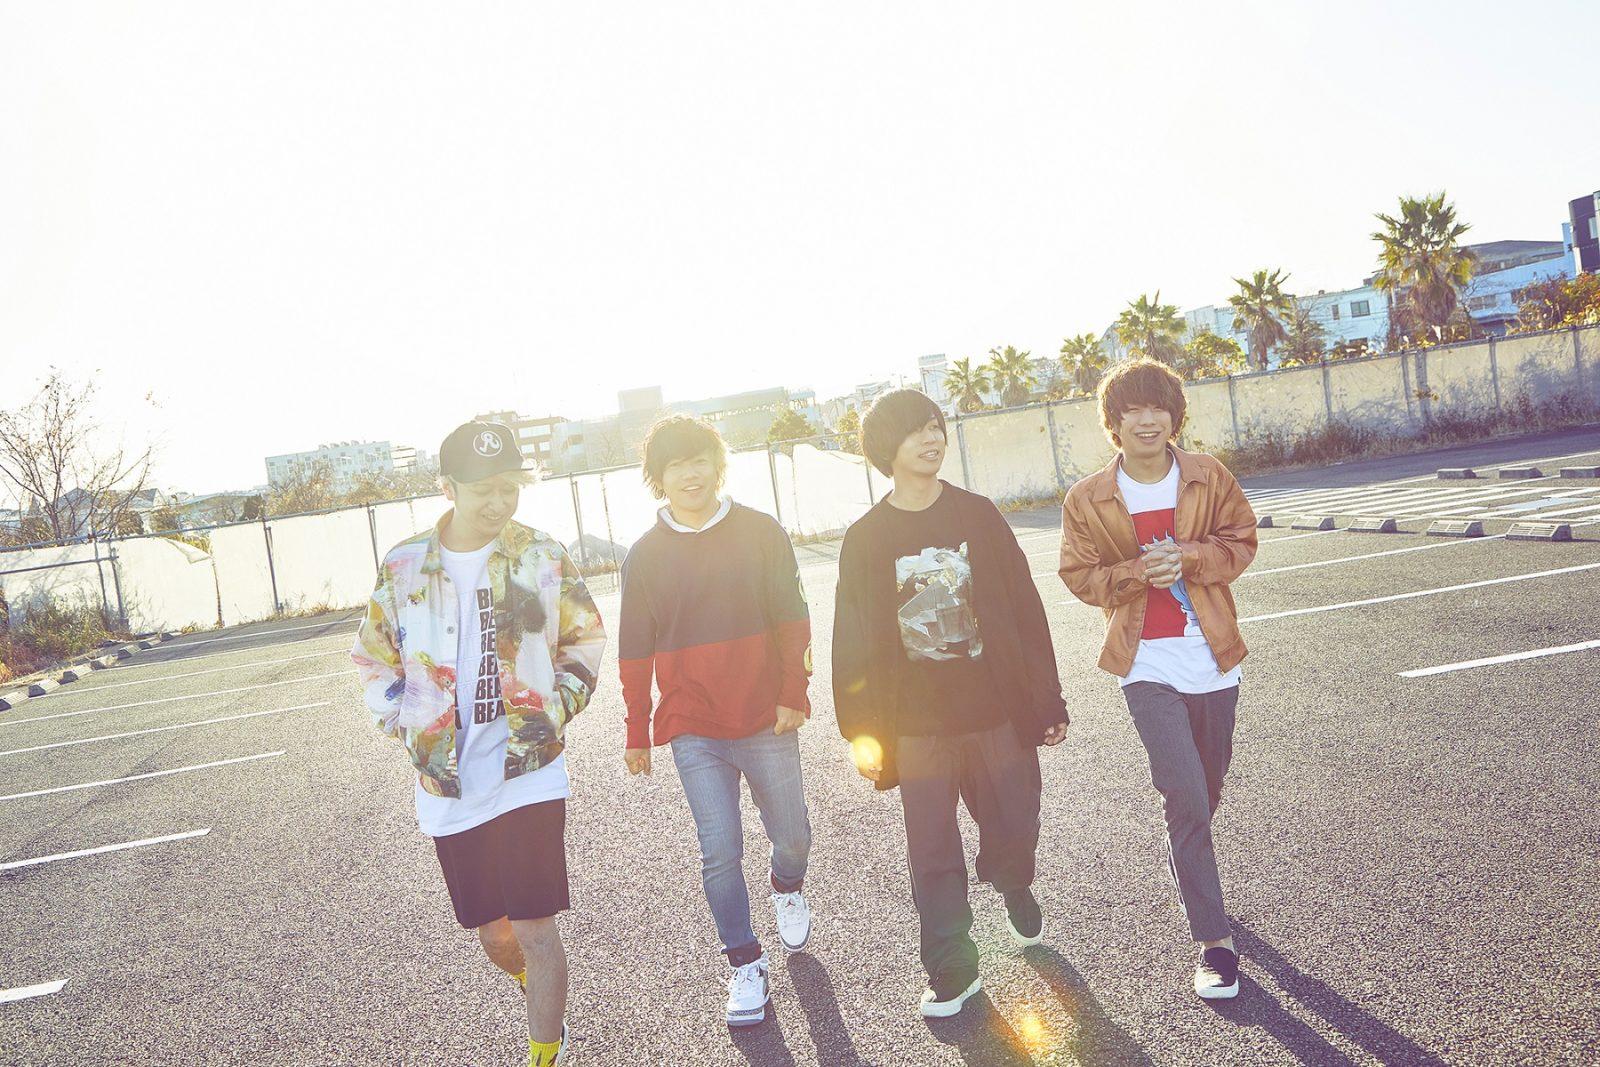 KEYTALK、3月7日に5thアルバム「Rainbow」リリース&2018年全国ツアータイトル決定サムネイル画像